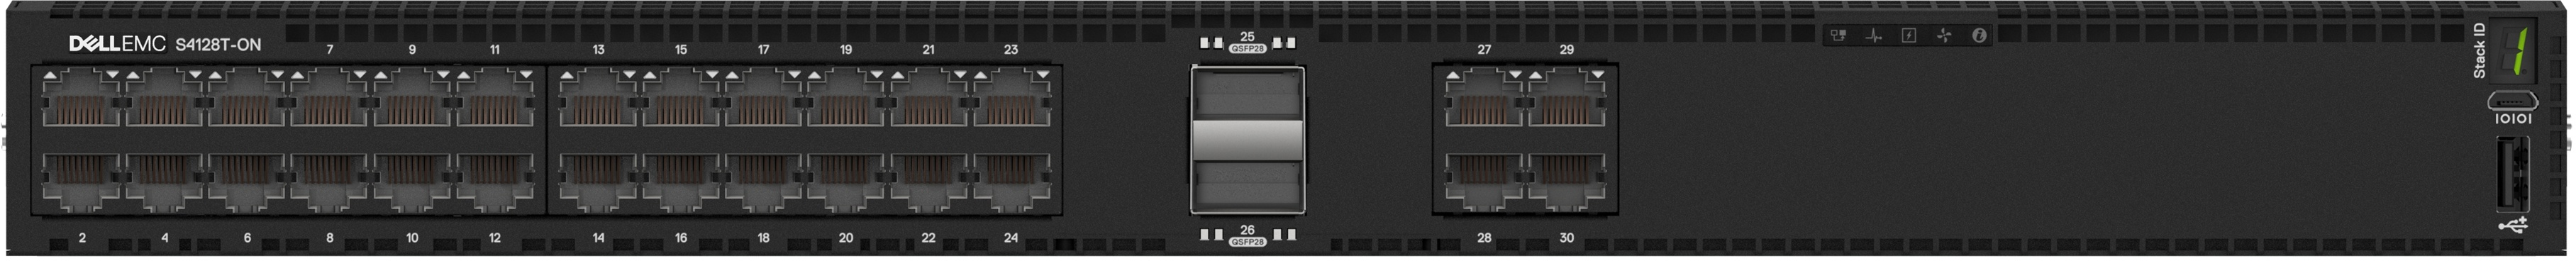 Dell S4128T - Kenmerken - Tweakers